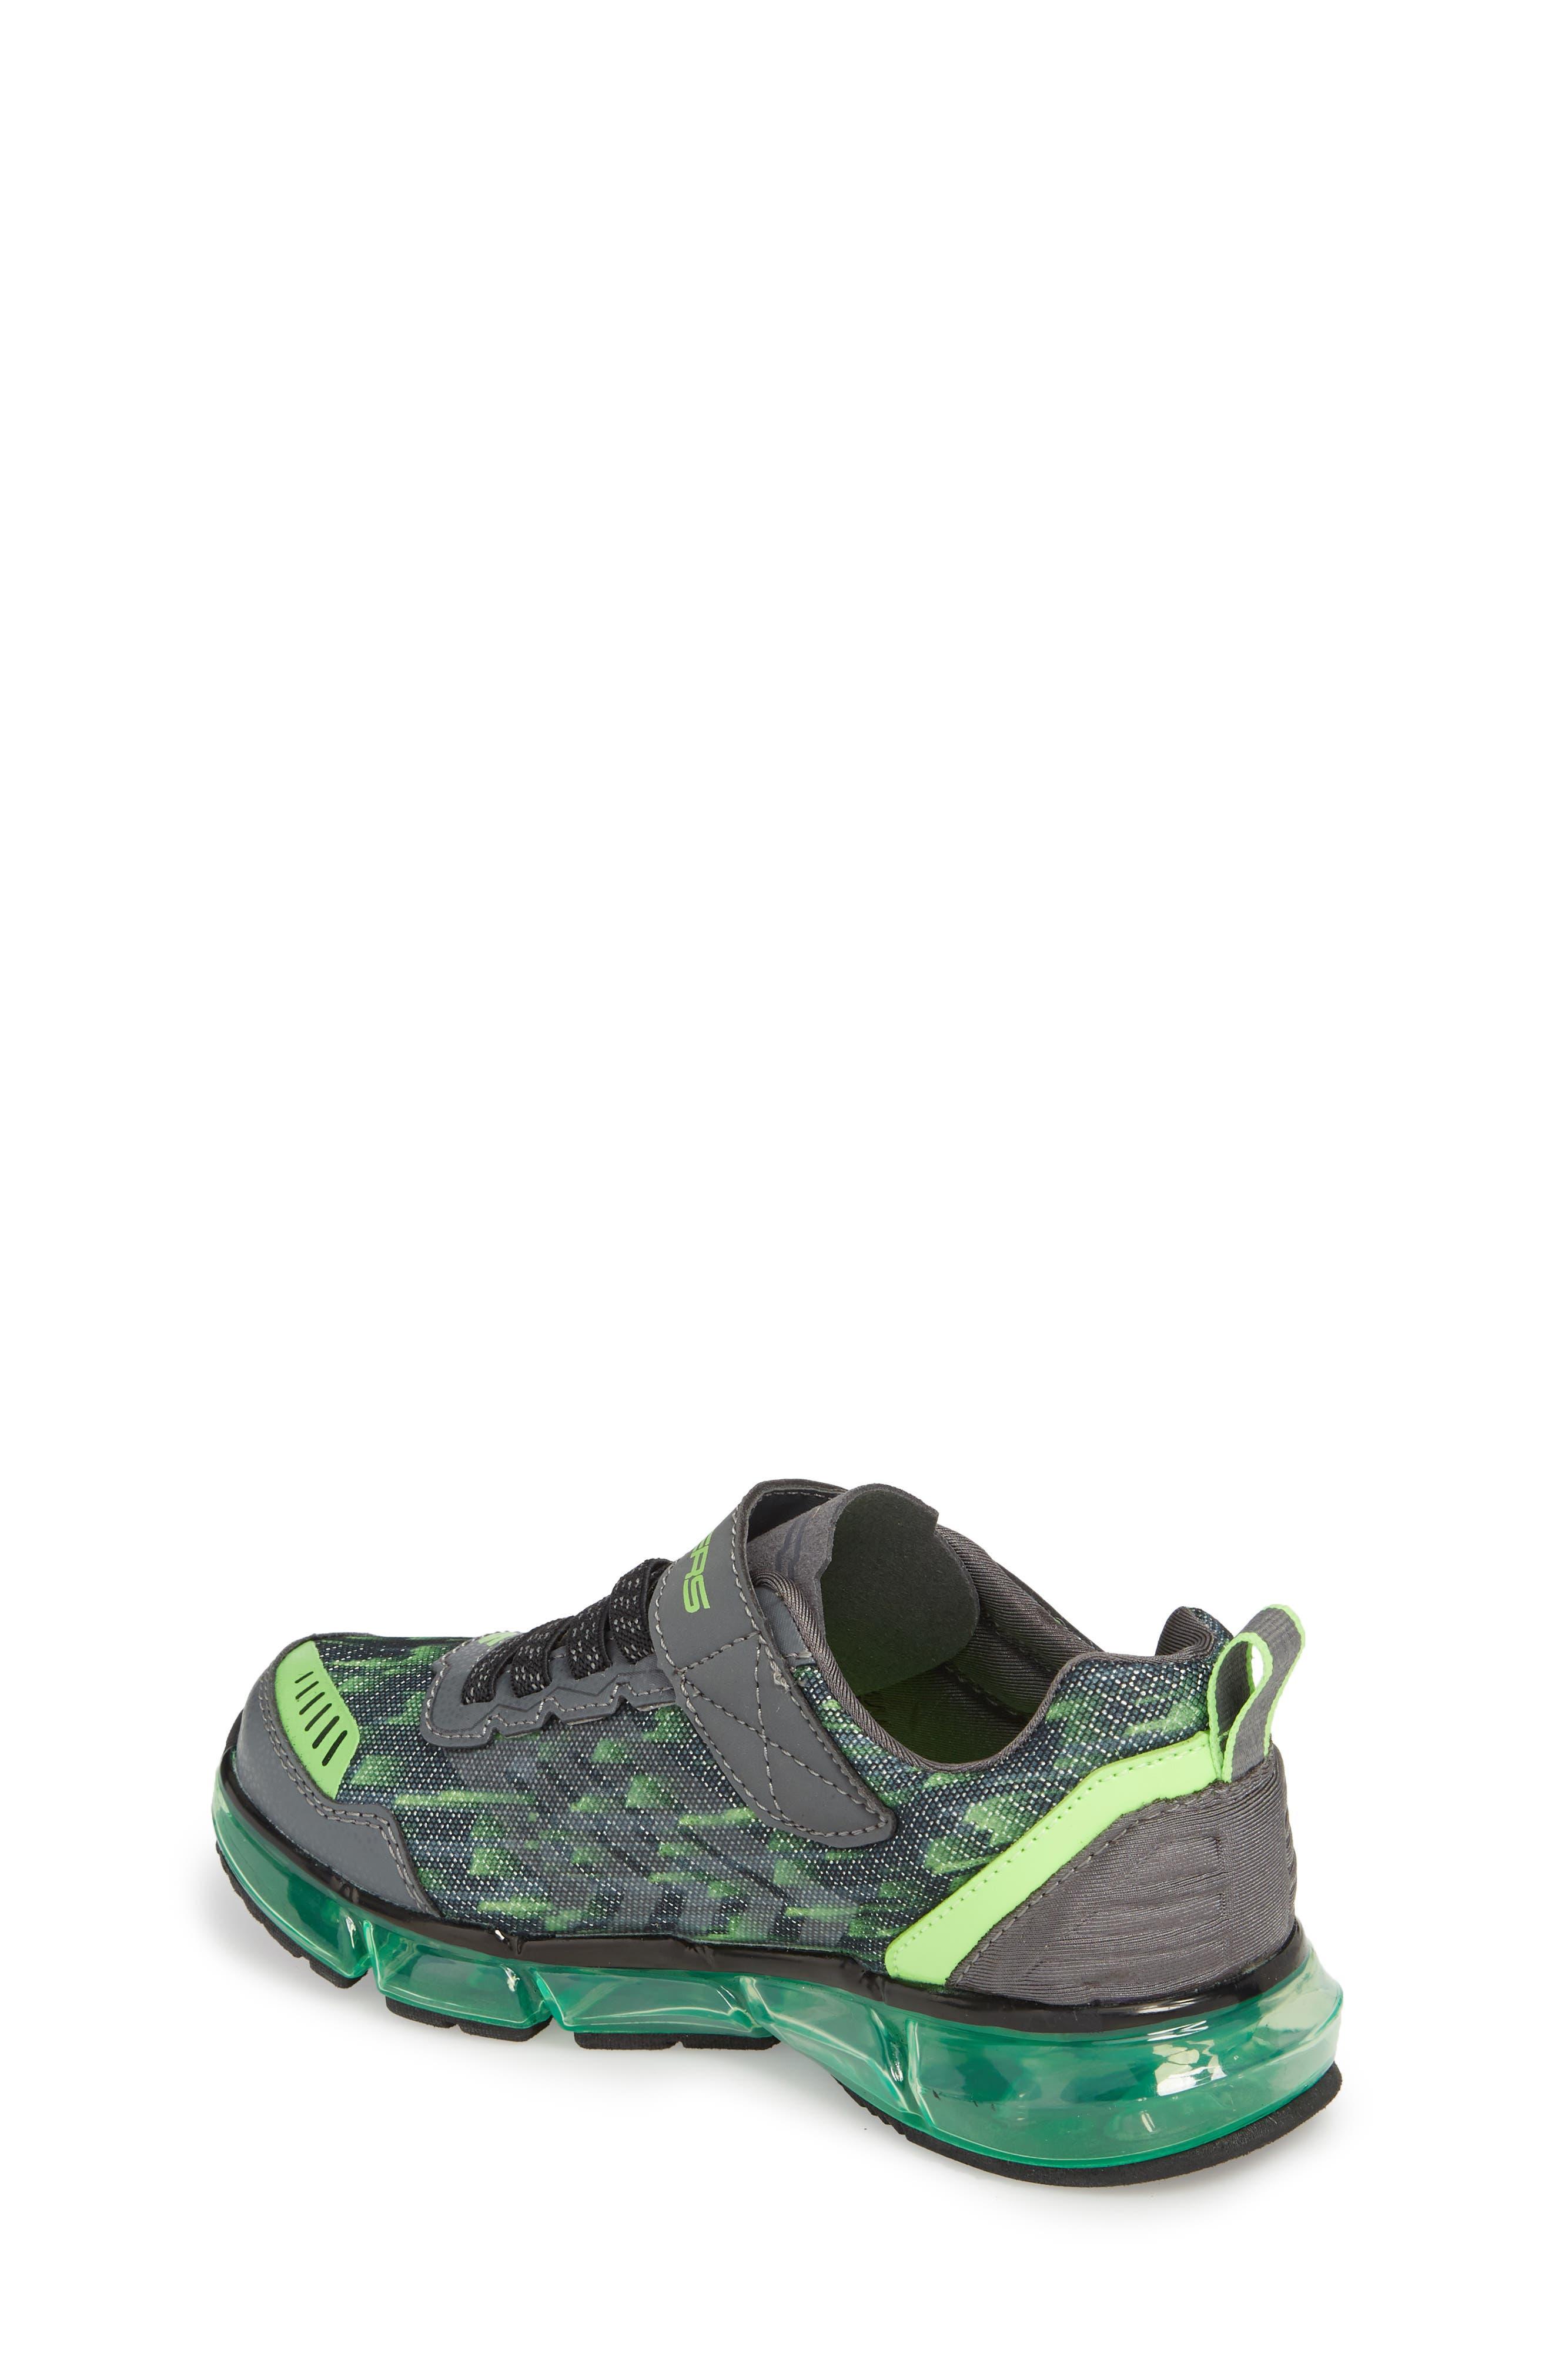 Skech-Air Mega Sneaker,                             Alternate thumbnail 2, color,                             Black/ Charcoal/ Lime